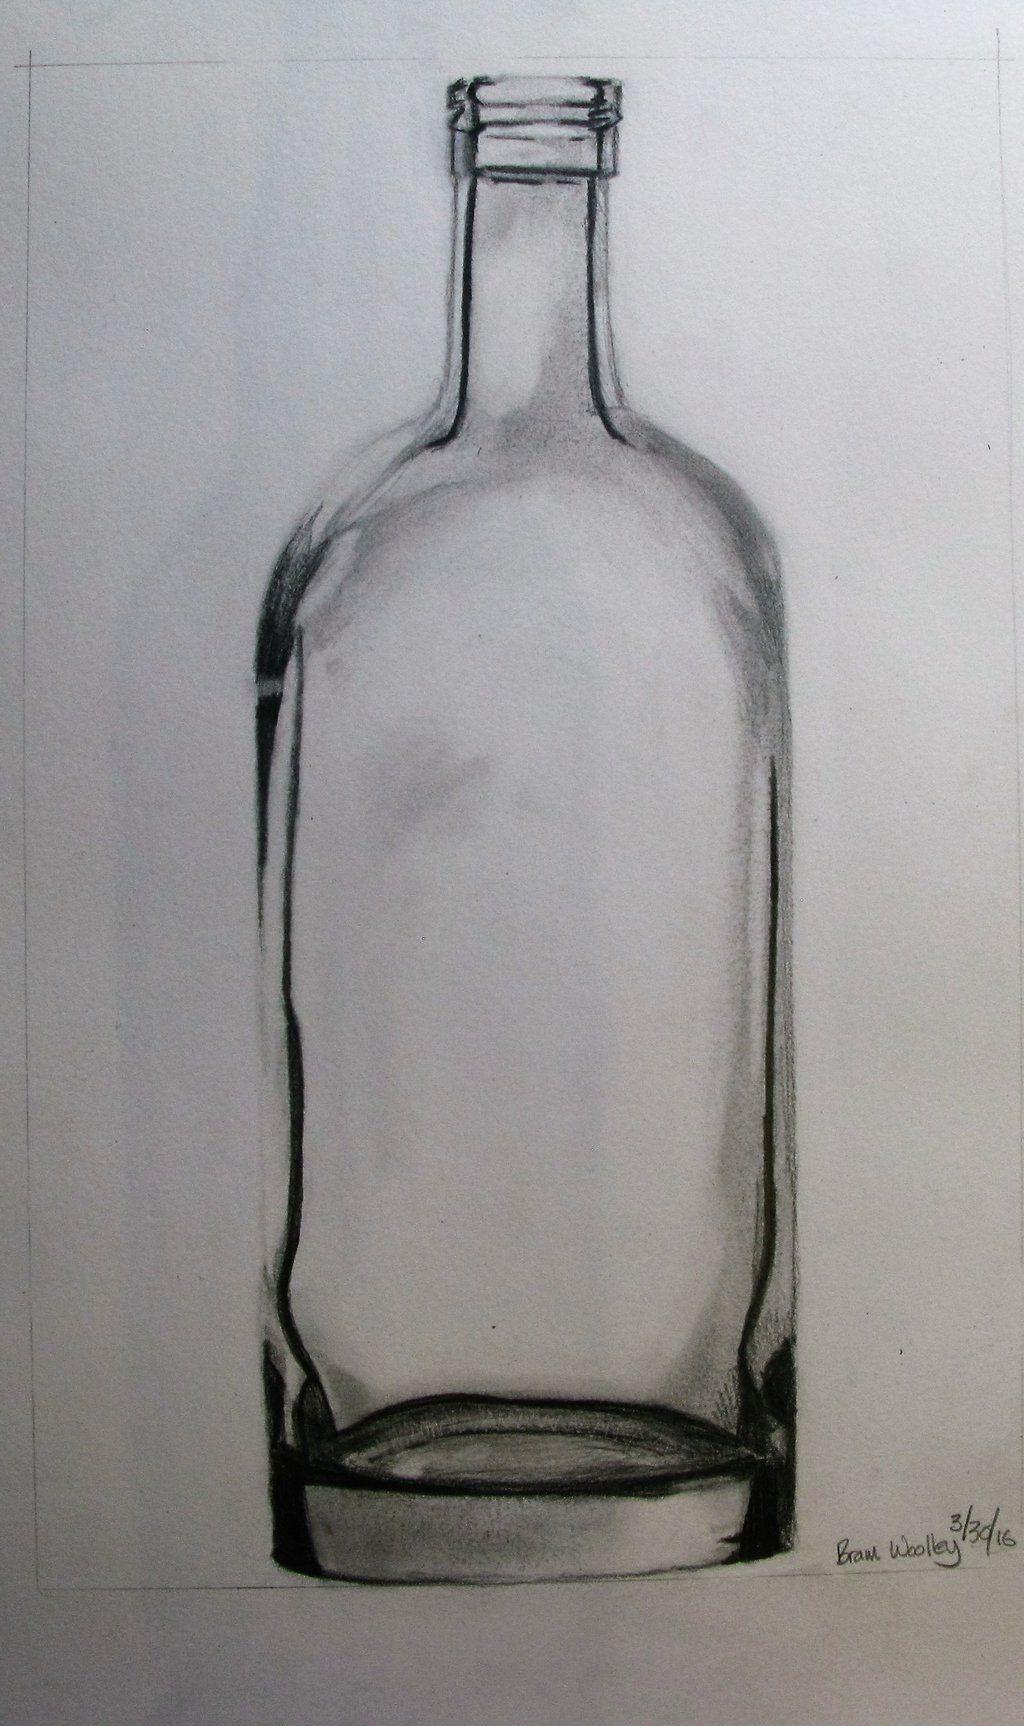 Glass Bottle Pencil Drawing 01 By Woolleybrammoth Bottle Drawing Pencil Drawings Glass Bottles